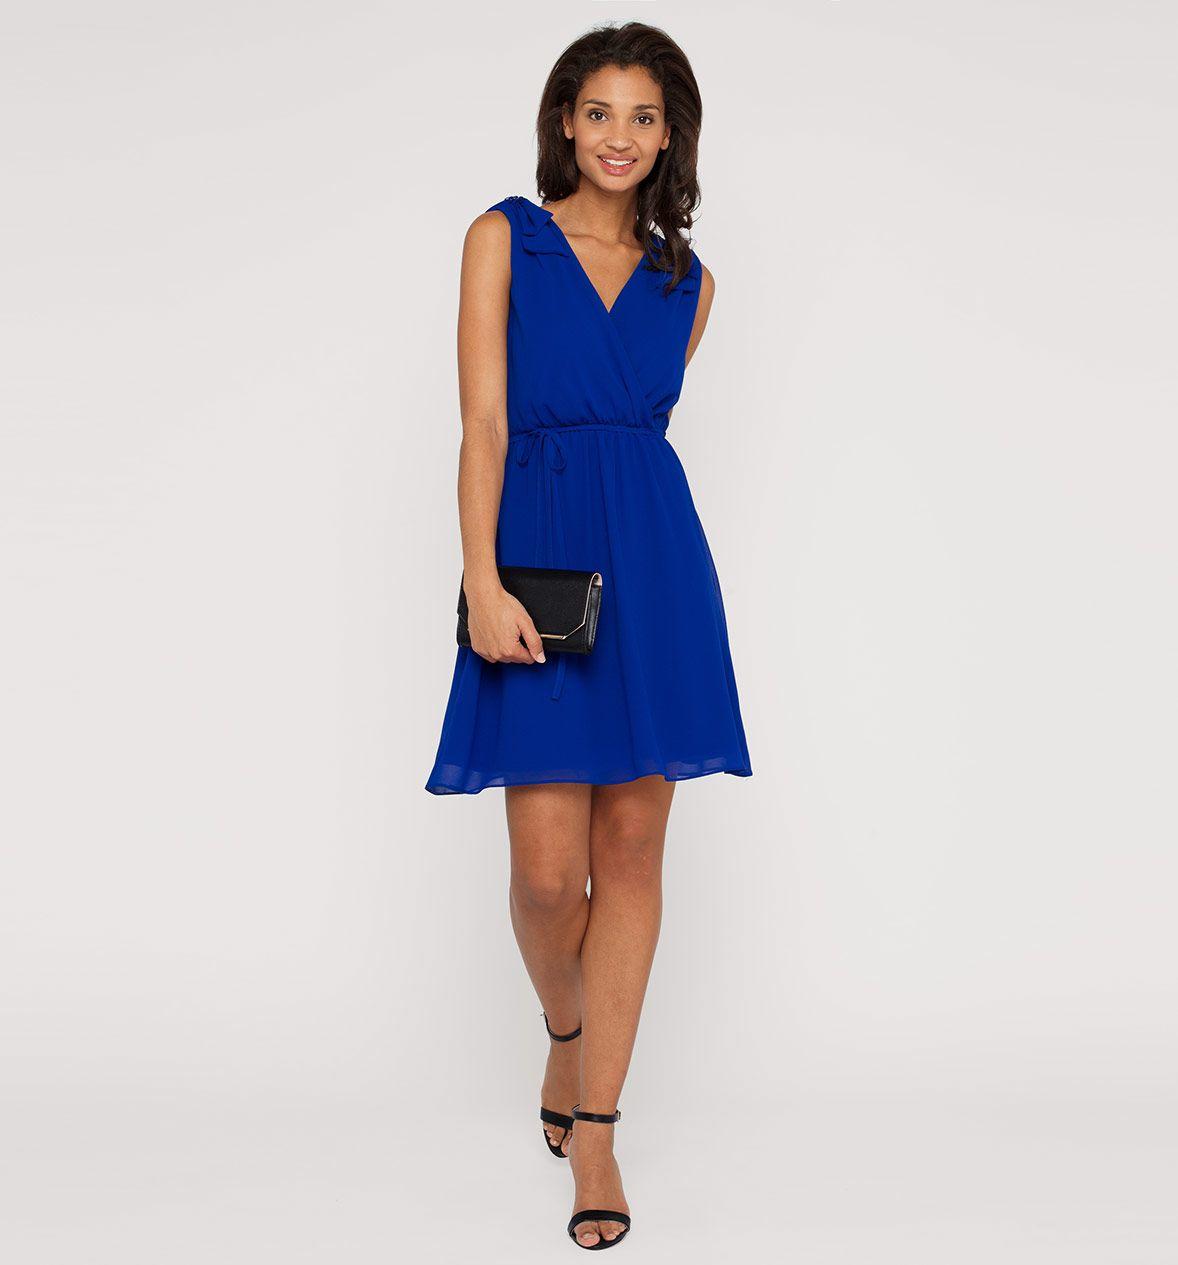 abendkleid in blau blaue kleider pinterest. Black Bedroom Furniture Sets. Home Design Ideas